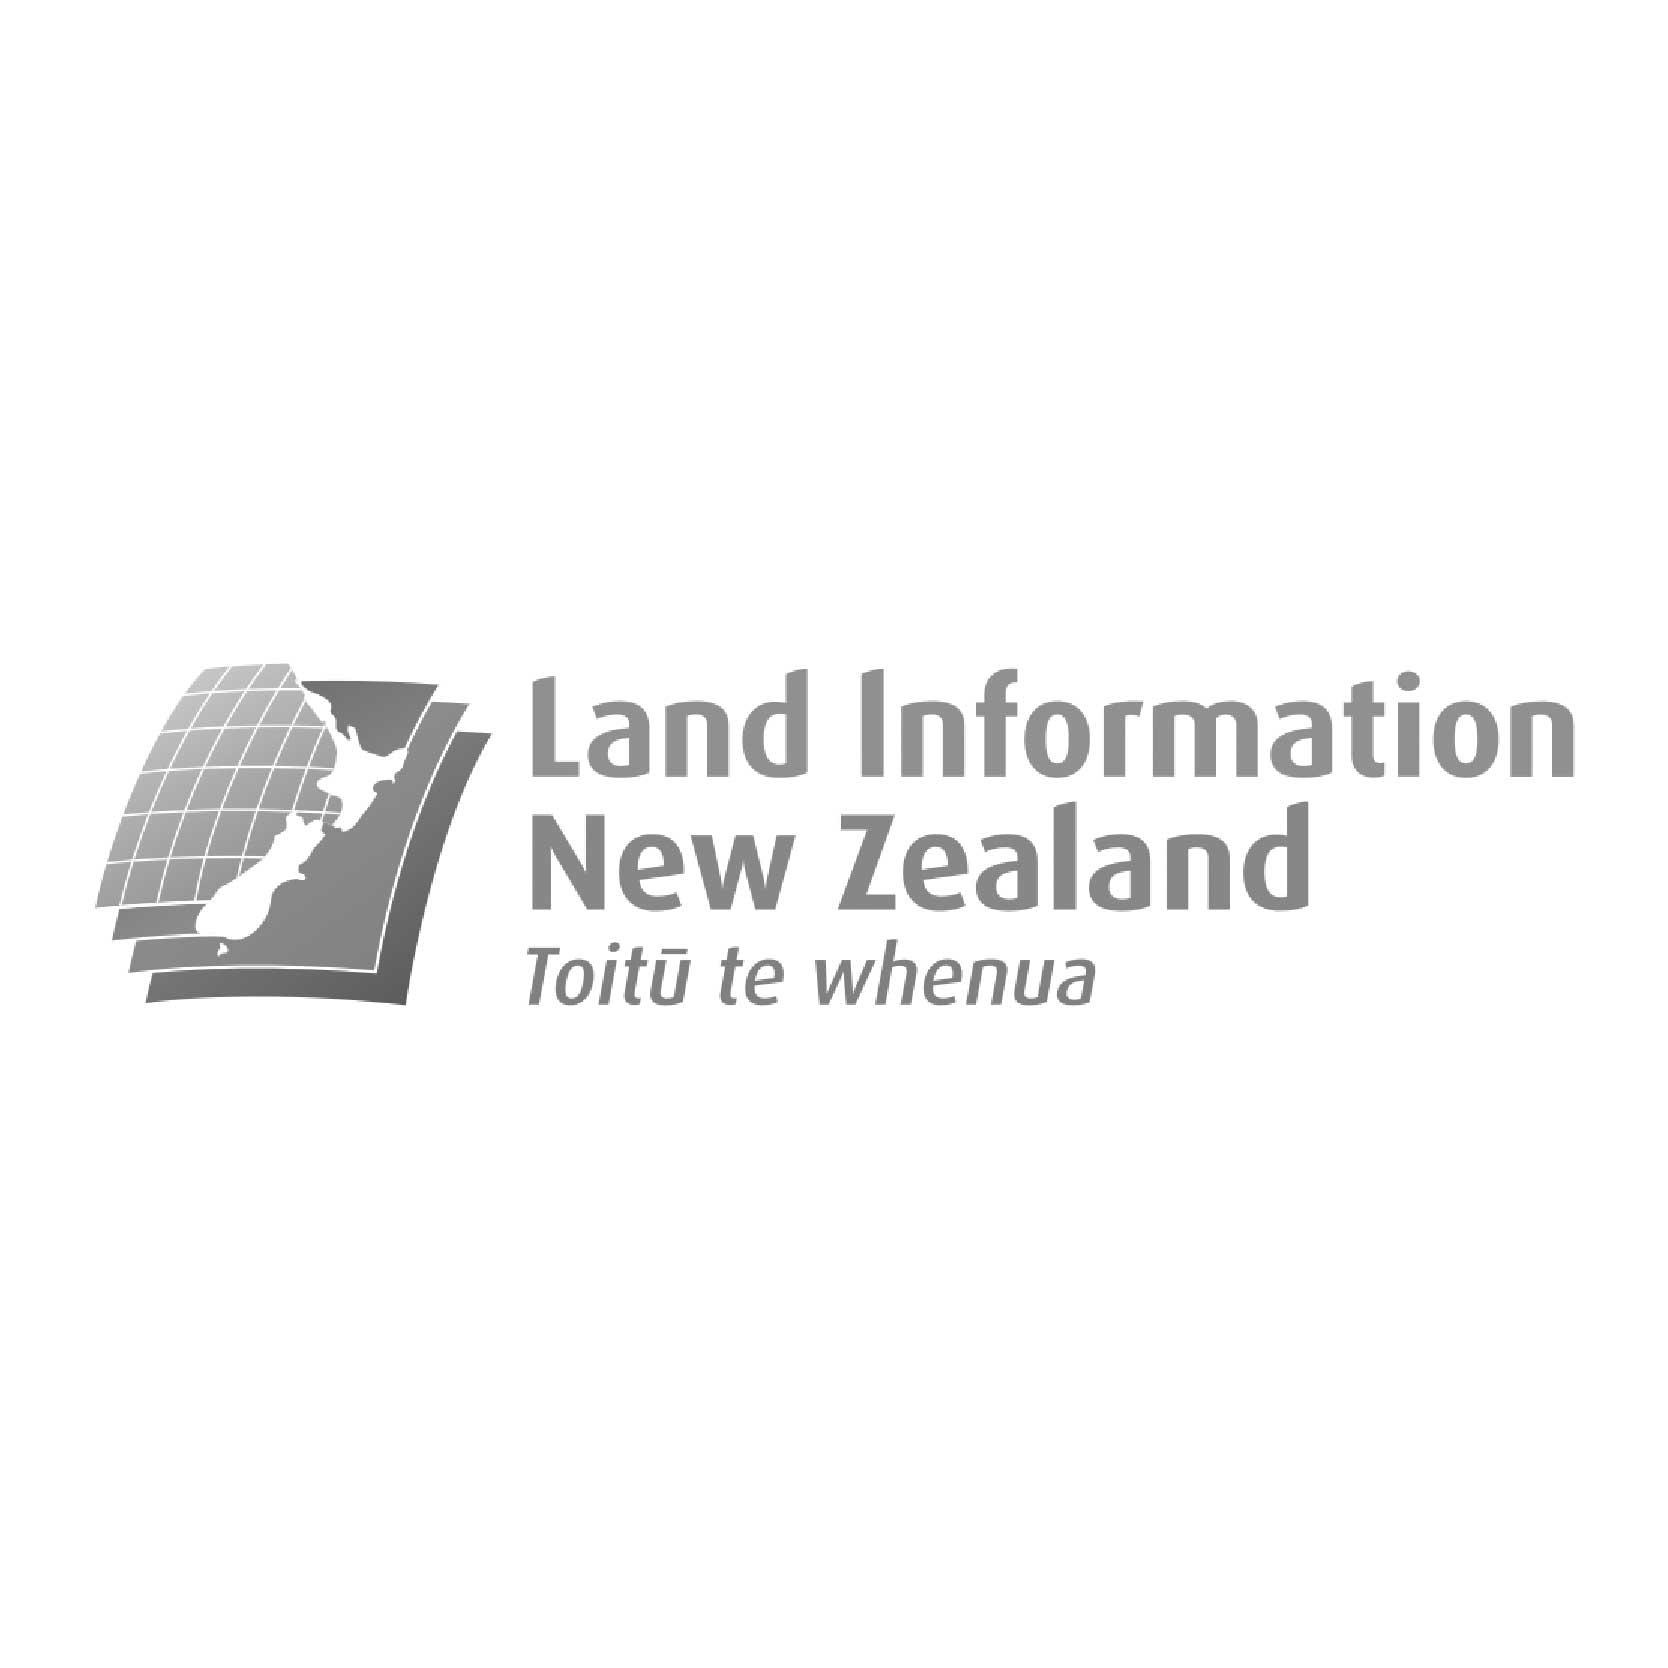 Land Information New Zealand